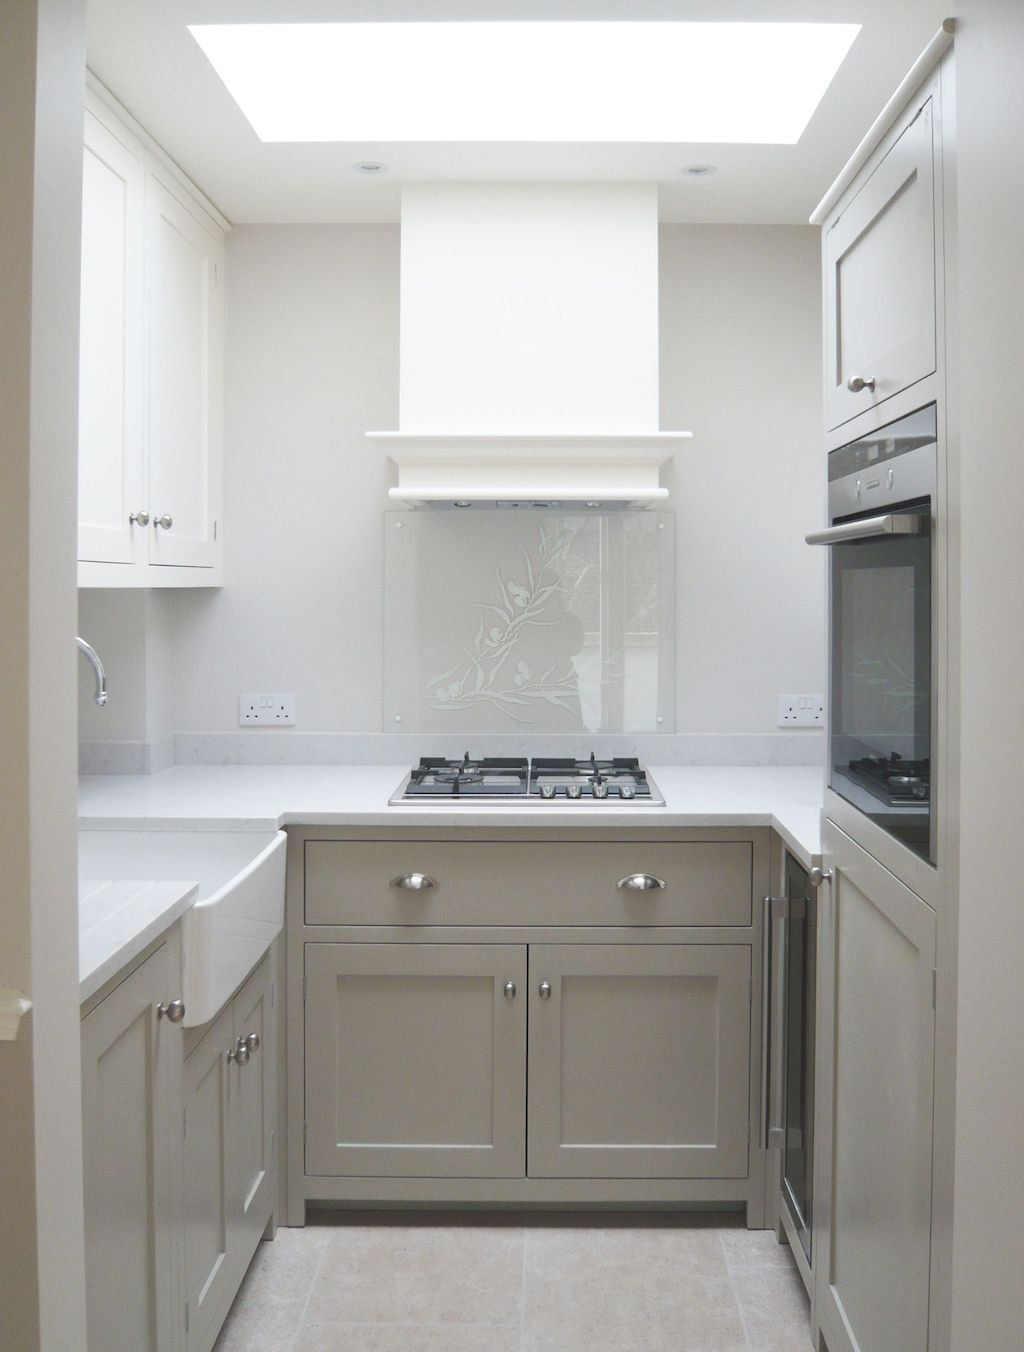 64 Amazing Tiny House Kitchen Design Ideas Kitchen